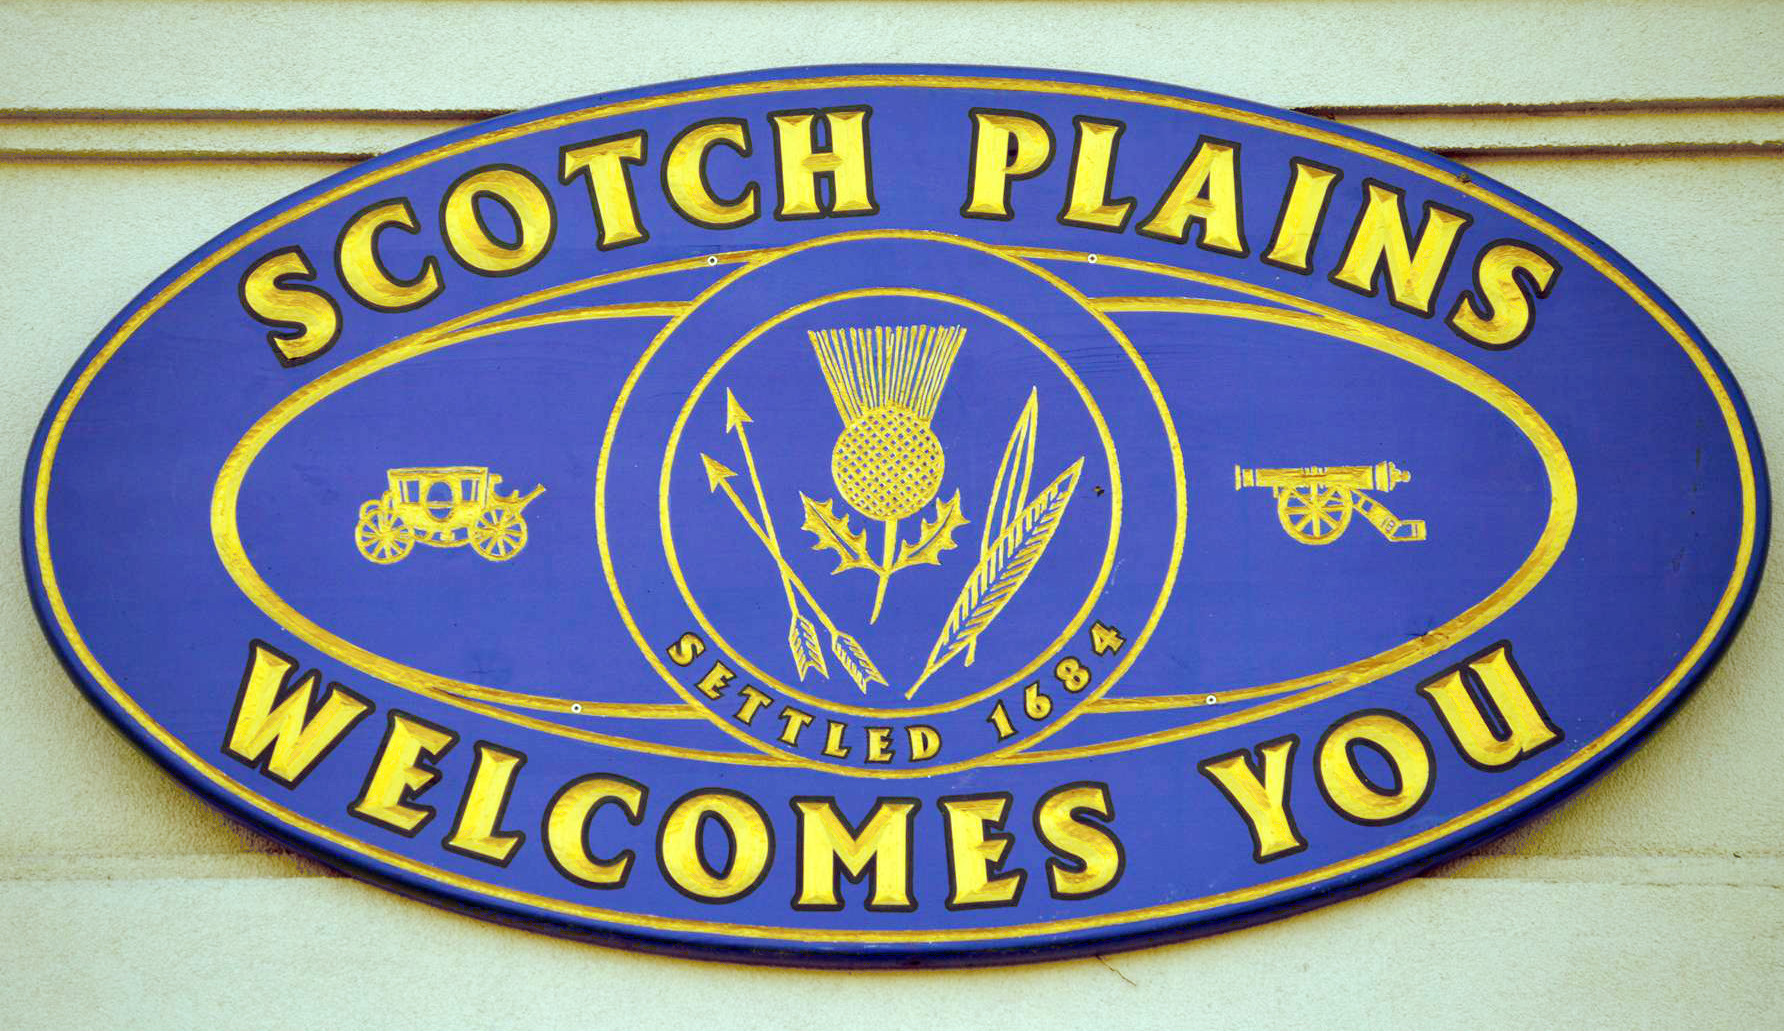 4833d7d0a2fdc371dd8f_Scotch_Plains_town_logo.jpg